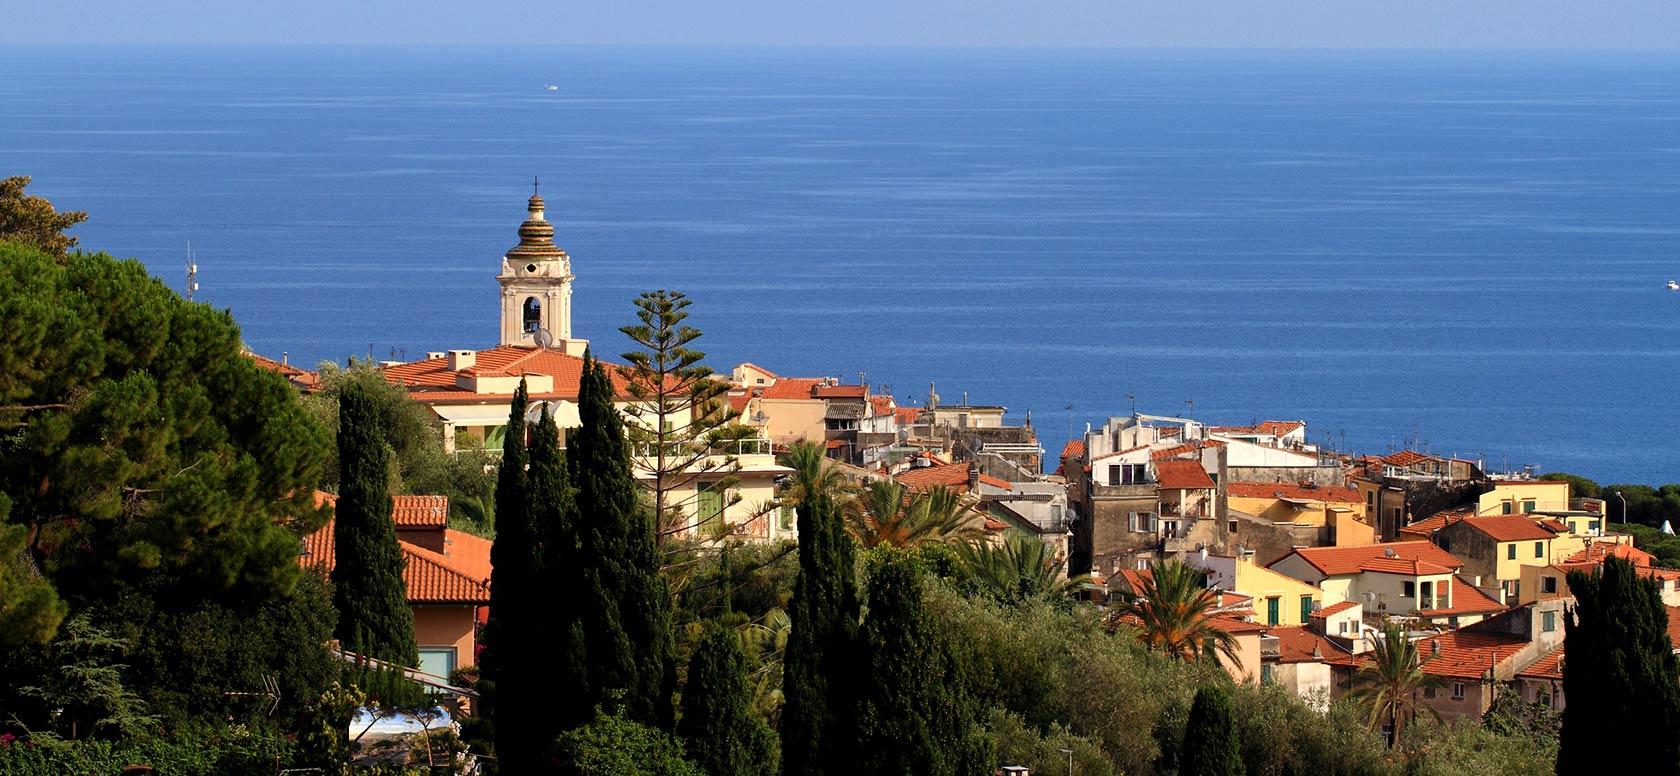 Property For Sale Bordighera Liguria